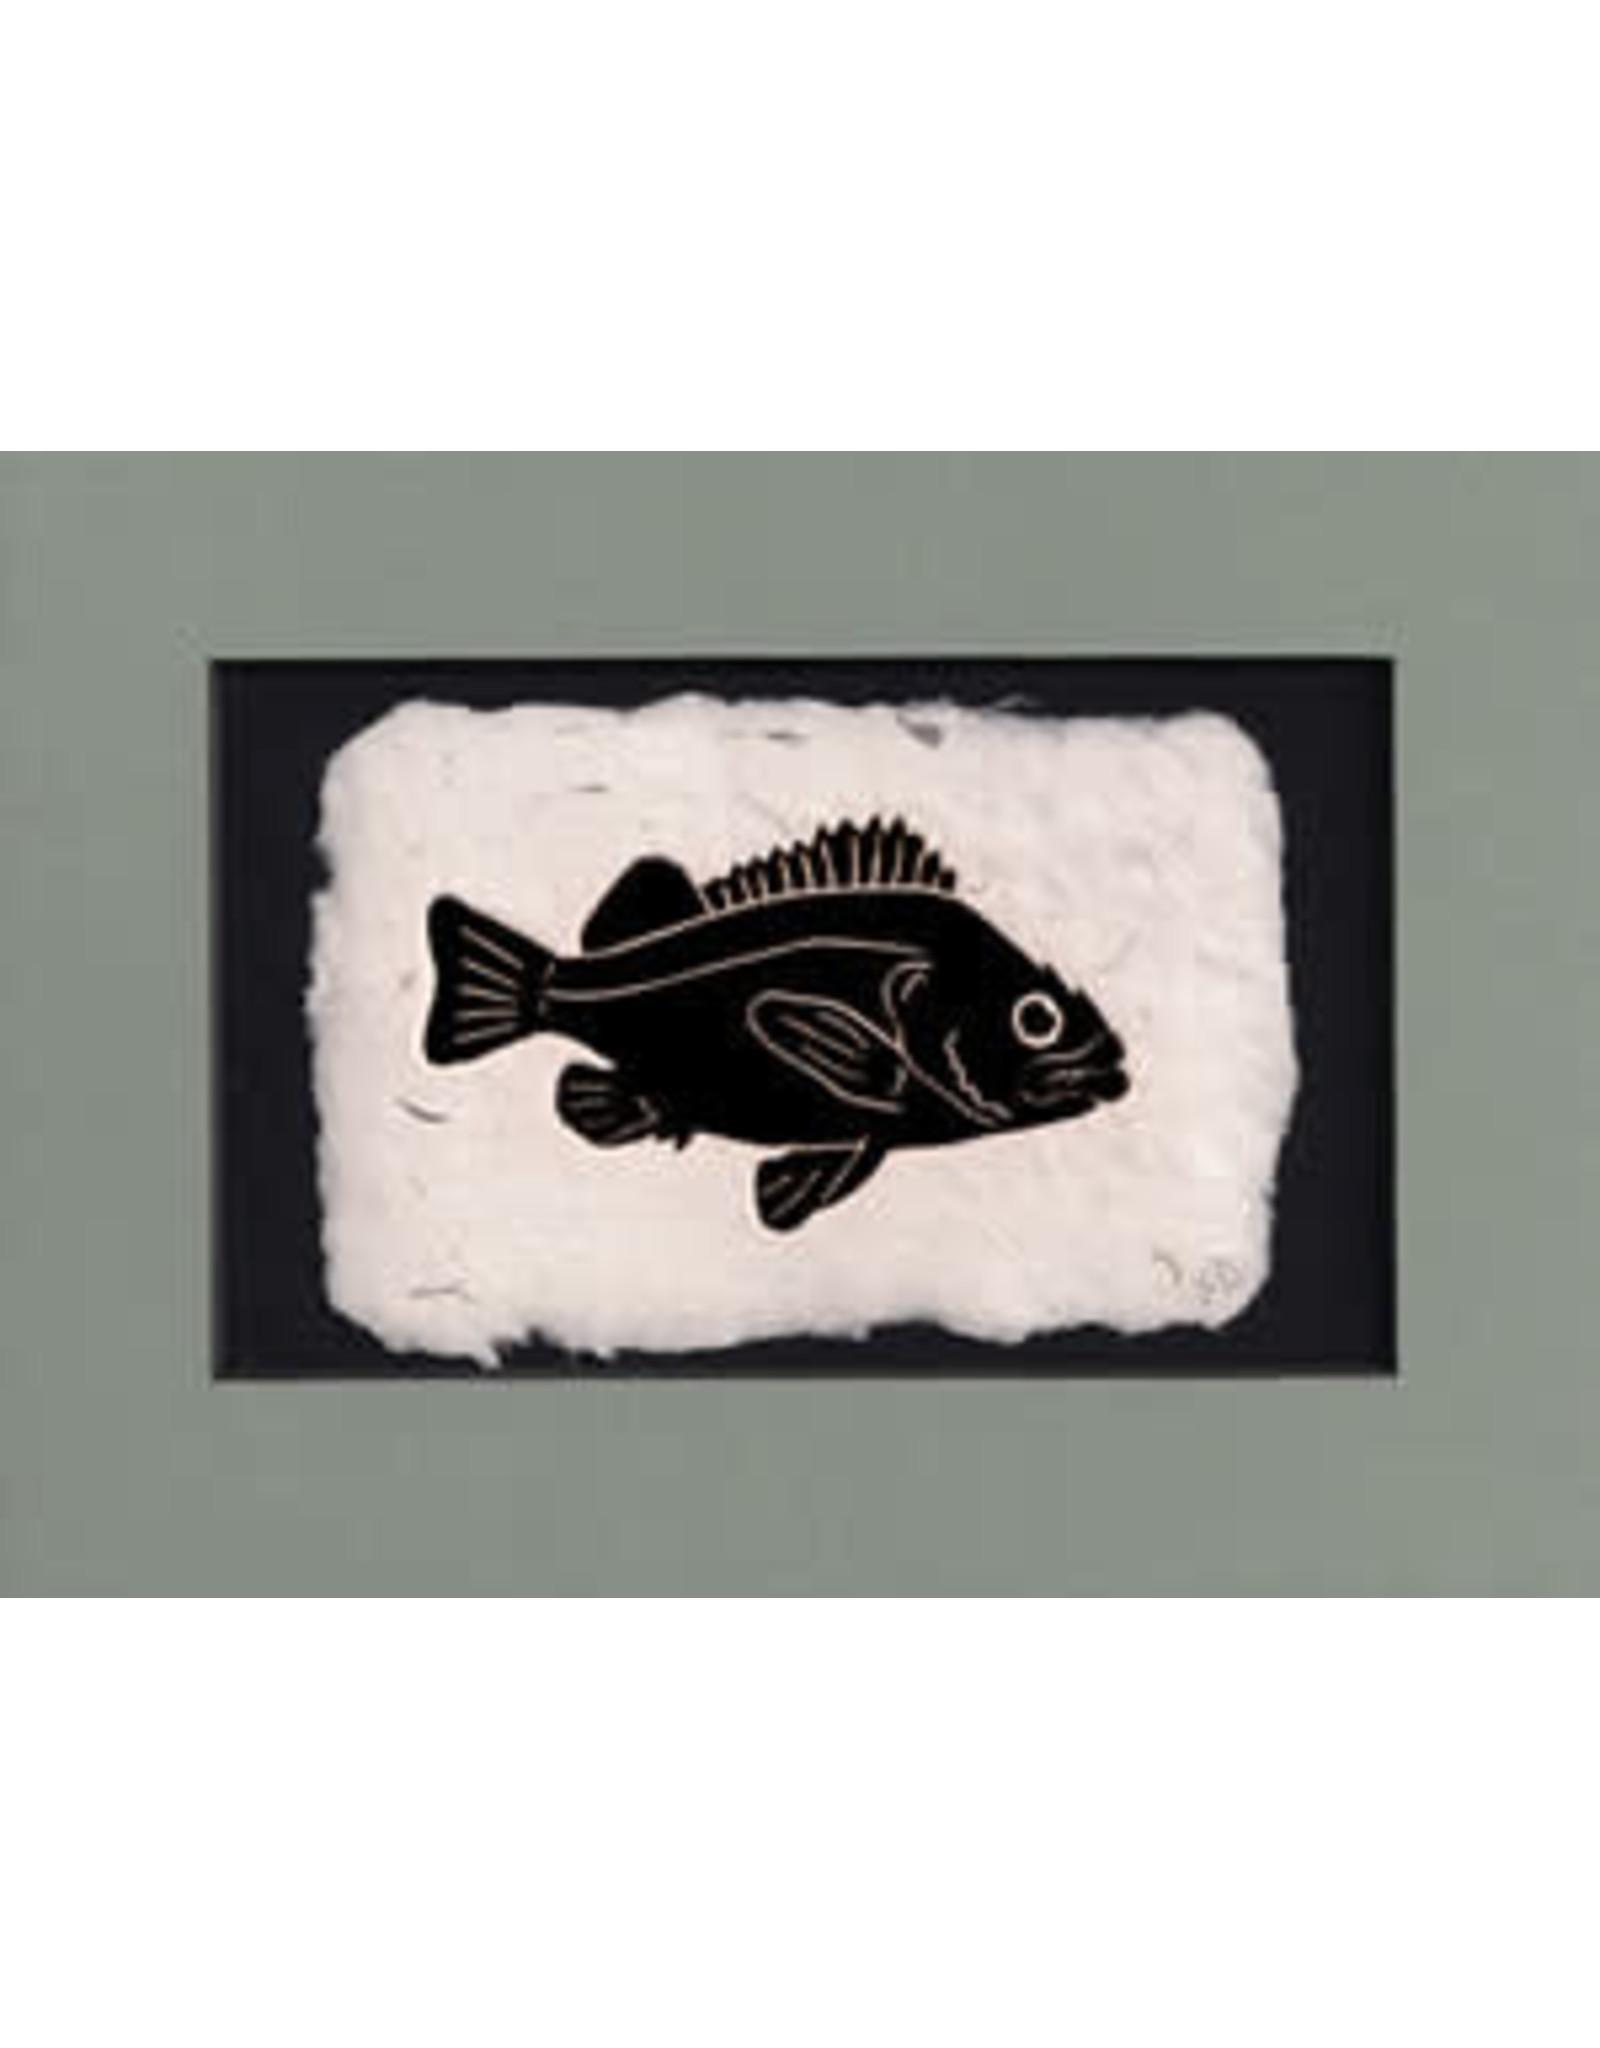 KB's Handmade Creations Rockfish | Karen Beason